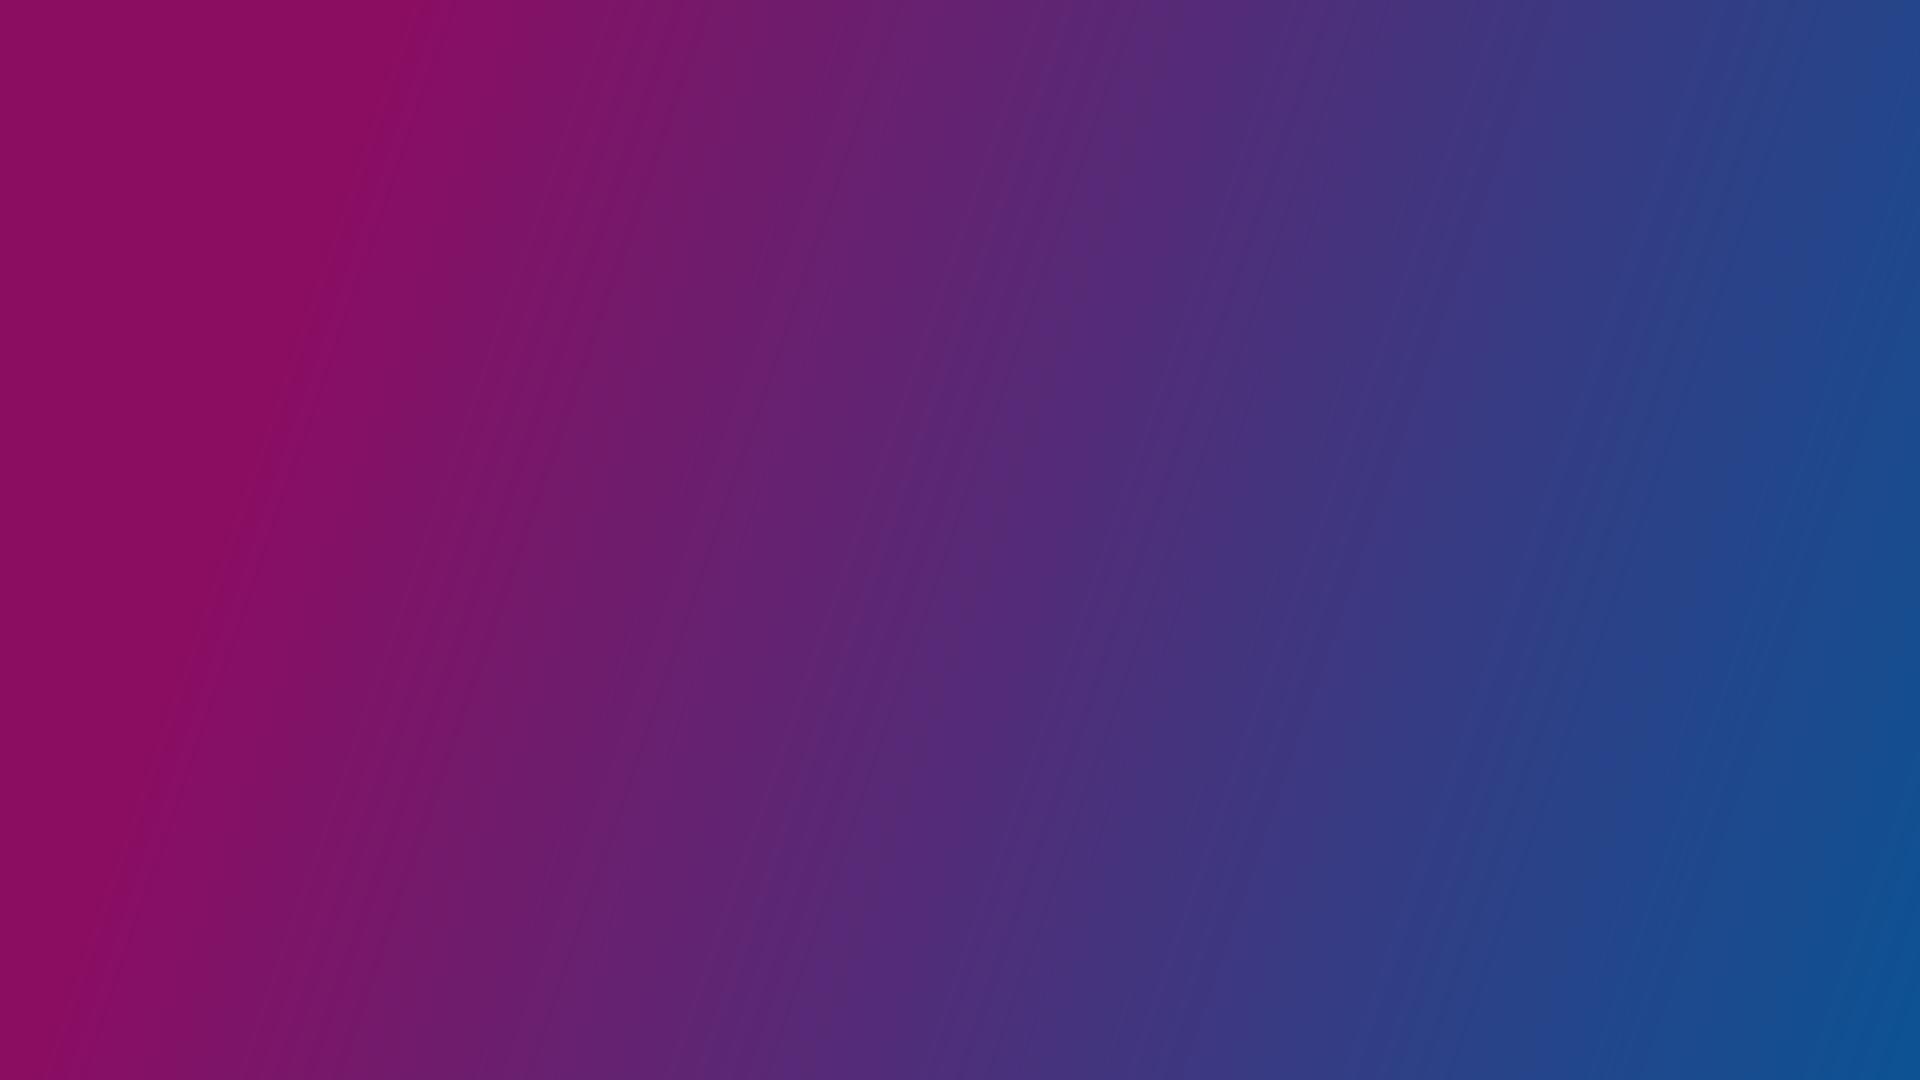 Purple Hue Gradient